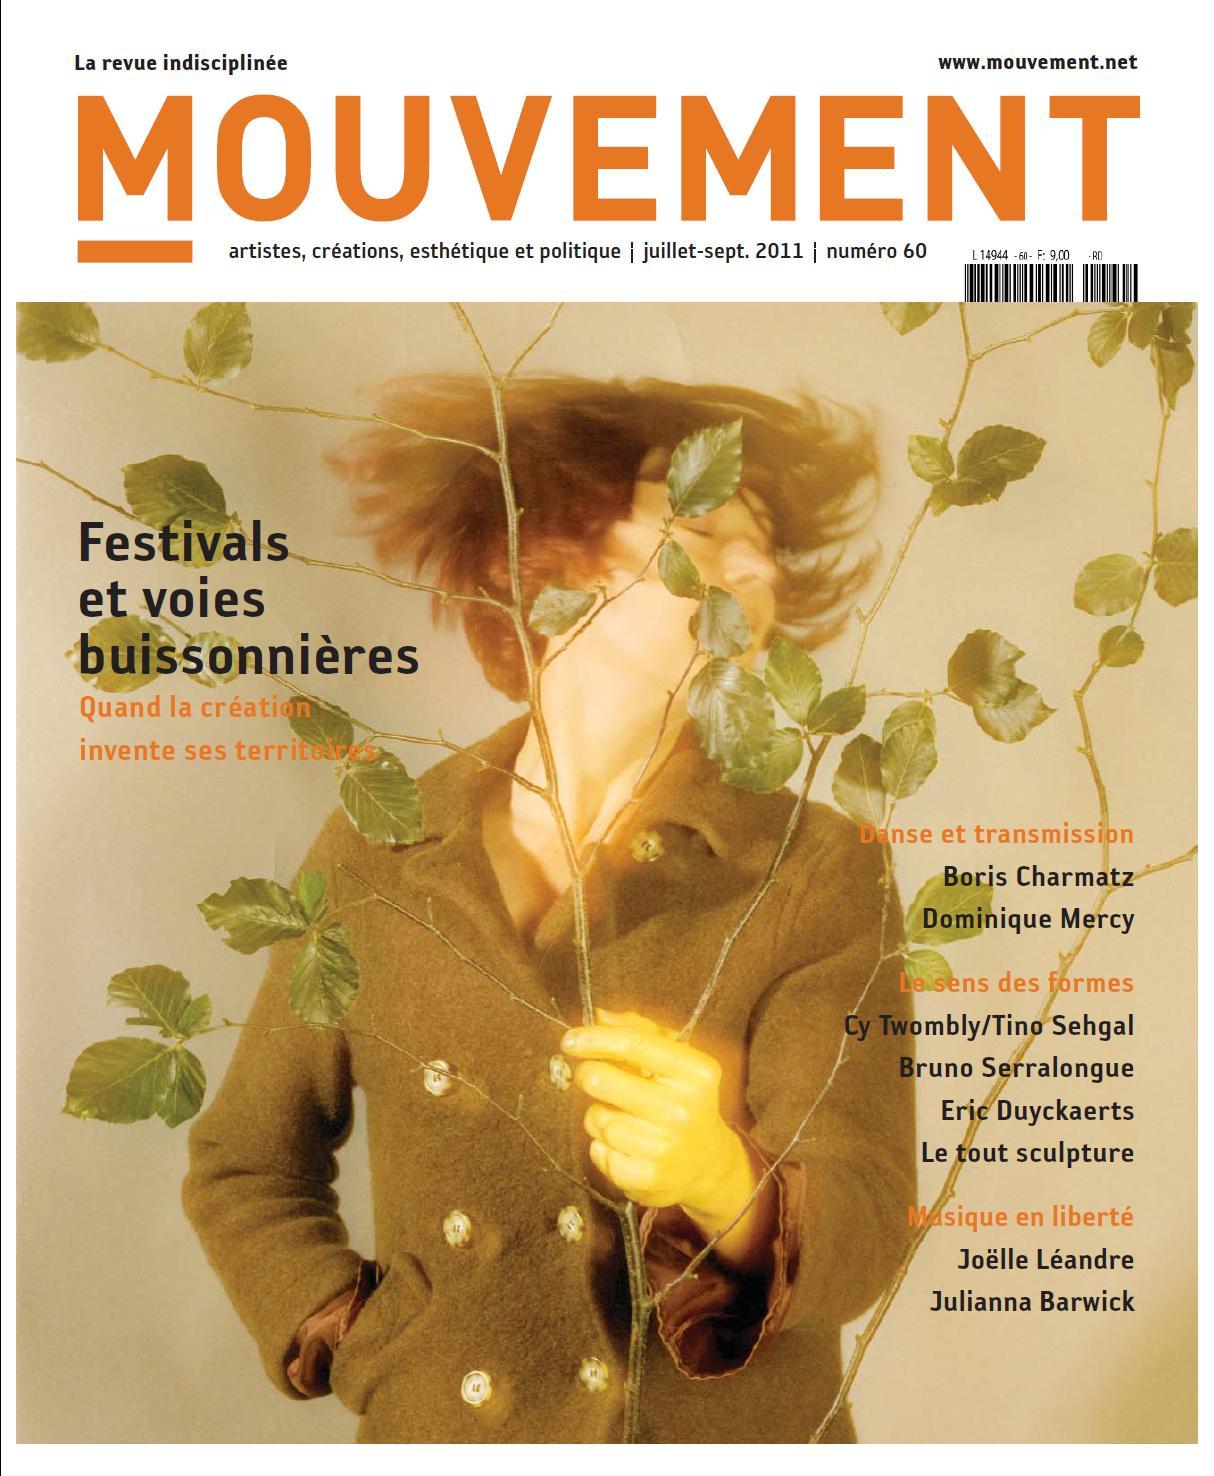 Mouvement N°60